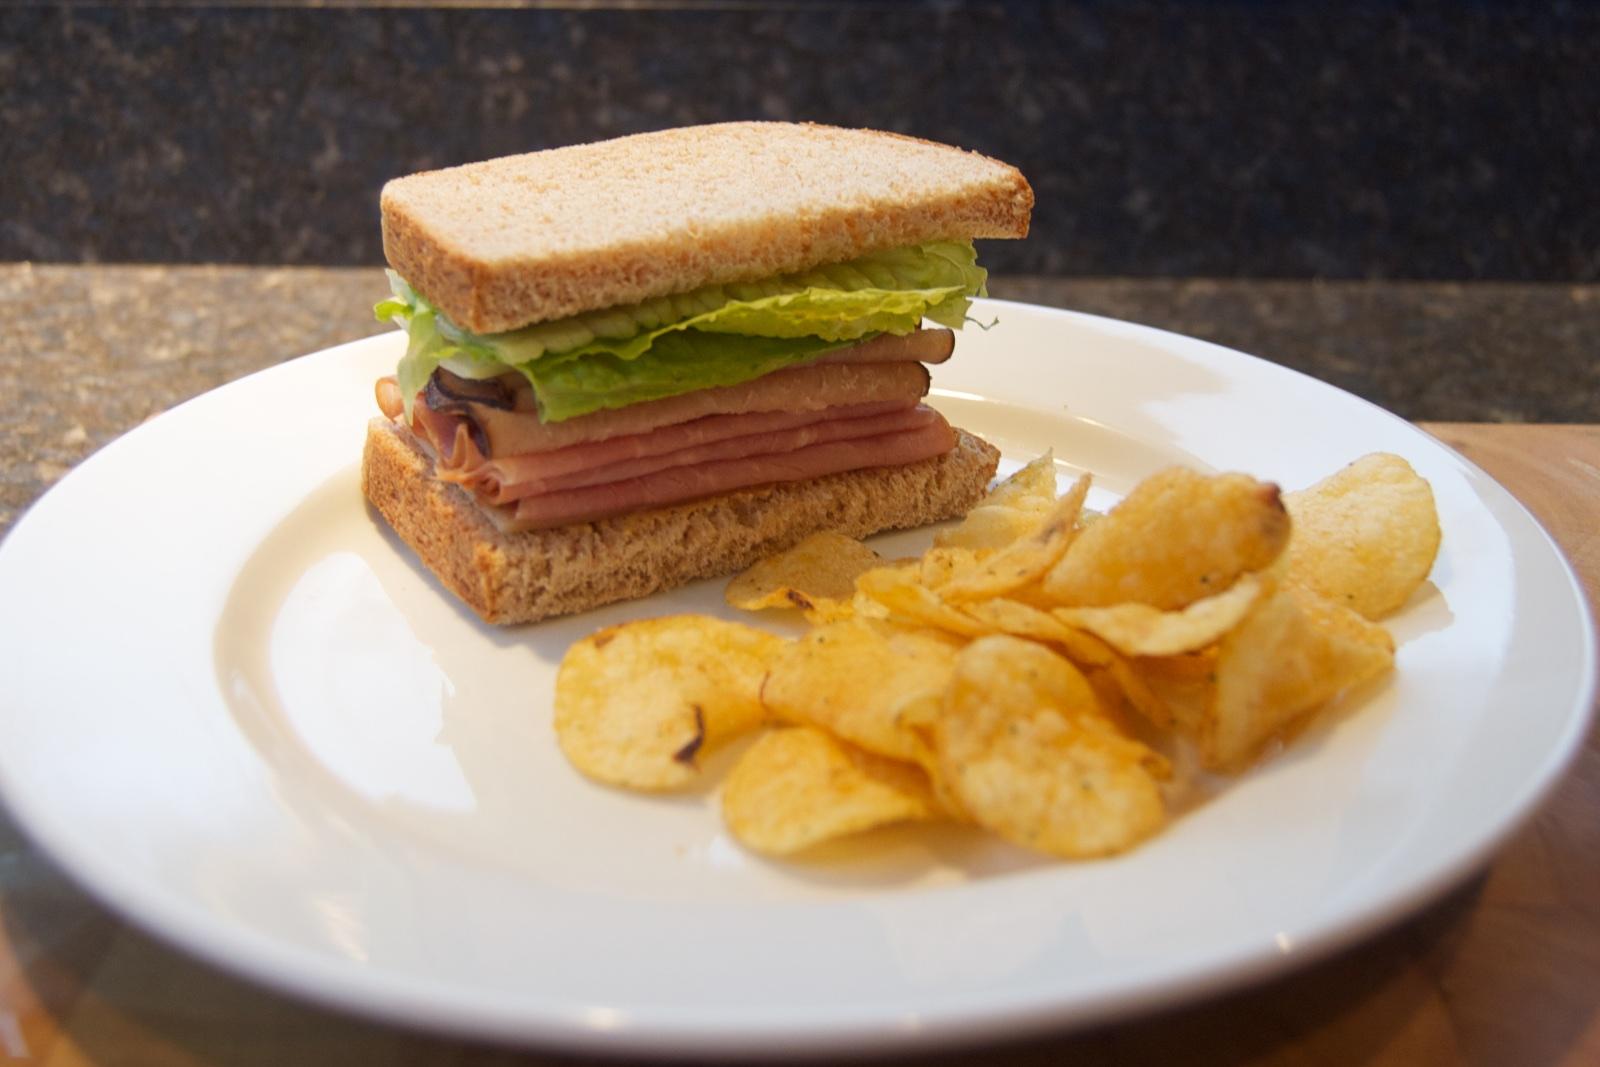 http://blog.rickk.com/food/2015/03/26/ate.2015.03.26.l.jpg